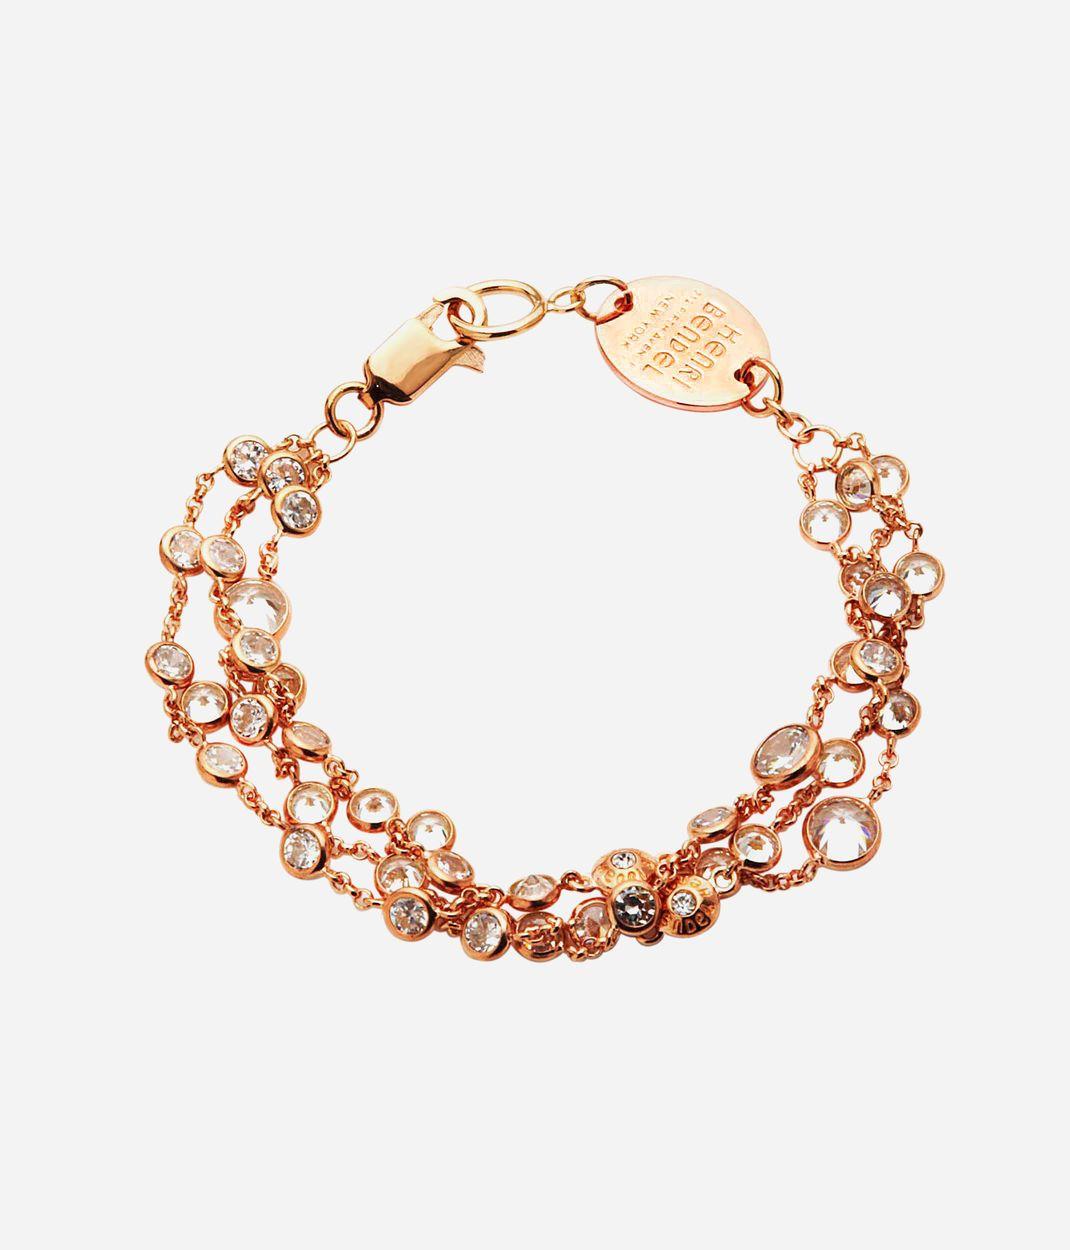 Uptown row bracelet designer bracelets bracelets for women